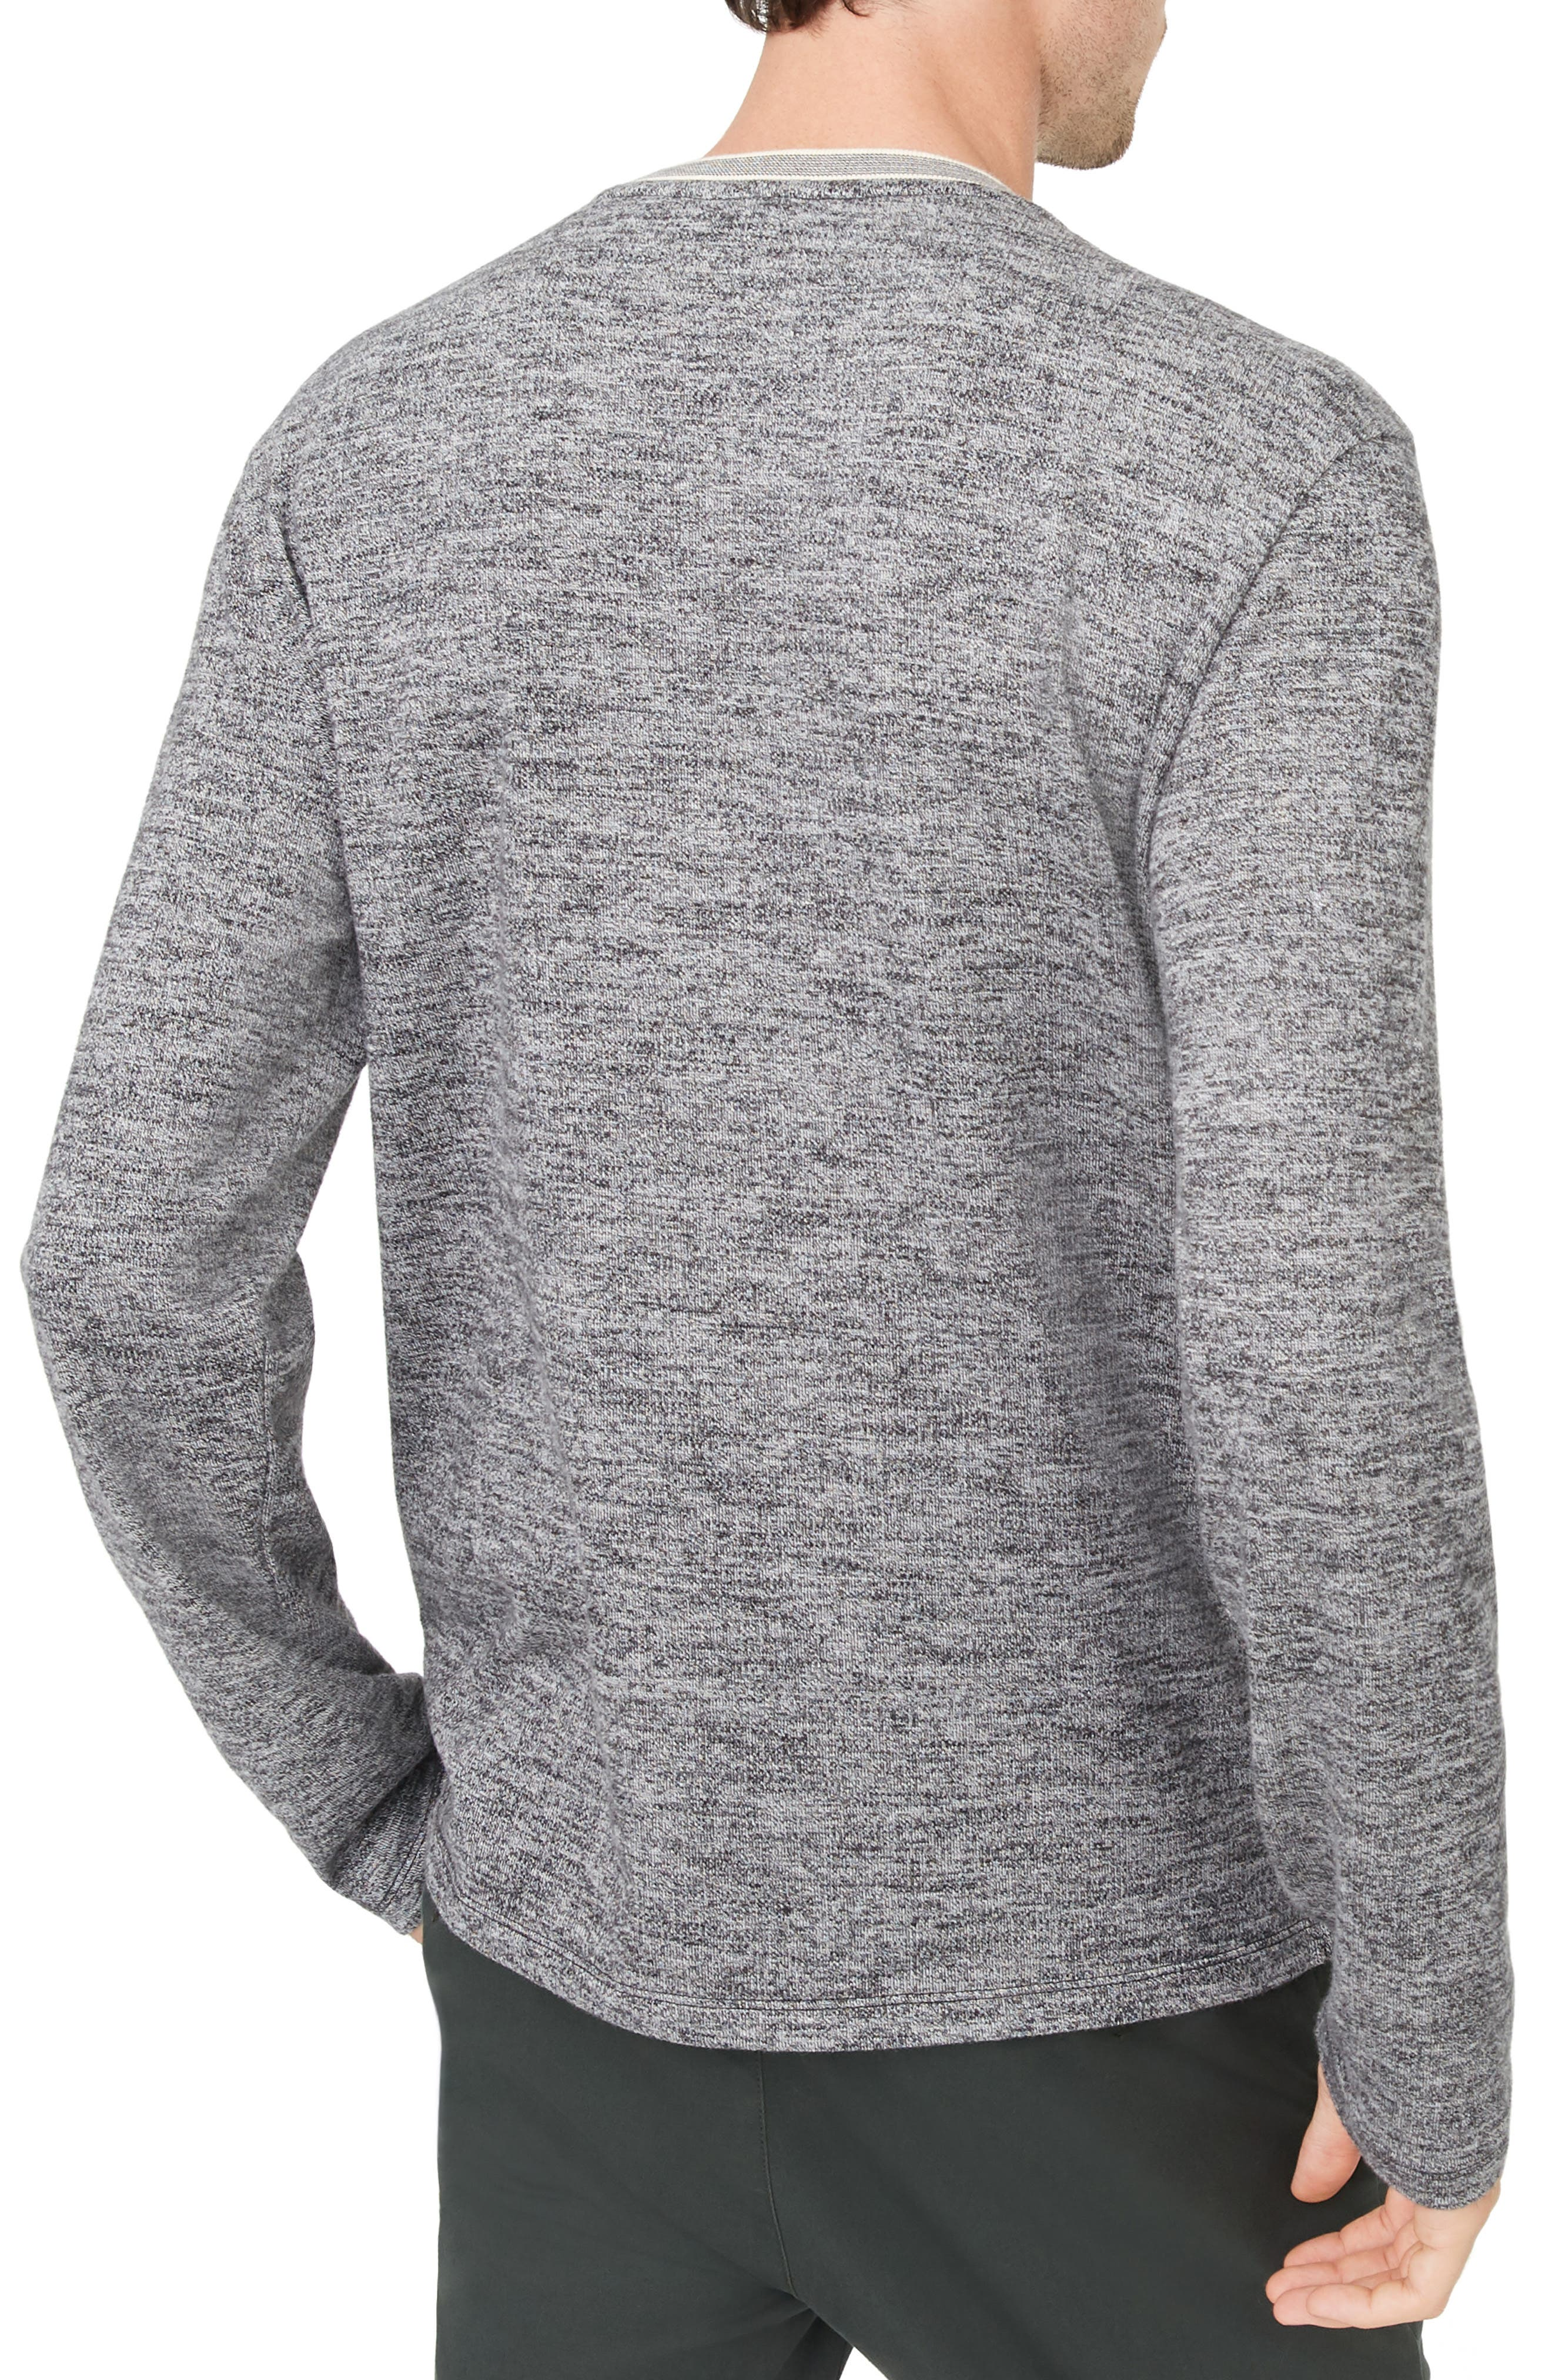 Marled Cotton Crewneck Shirt,                             Alternate thumbnail 2, color,                             CHARCOAL HEATHER